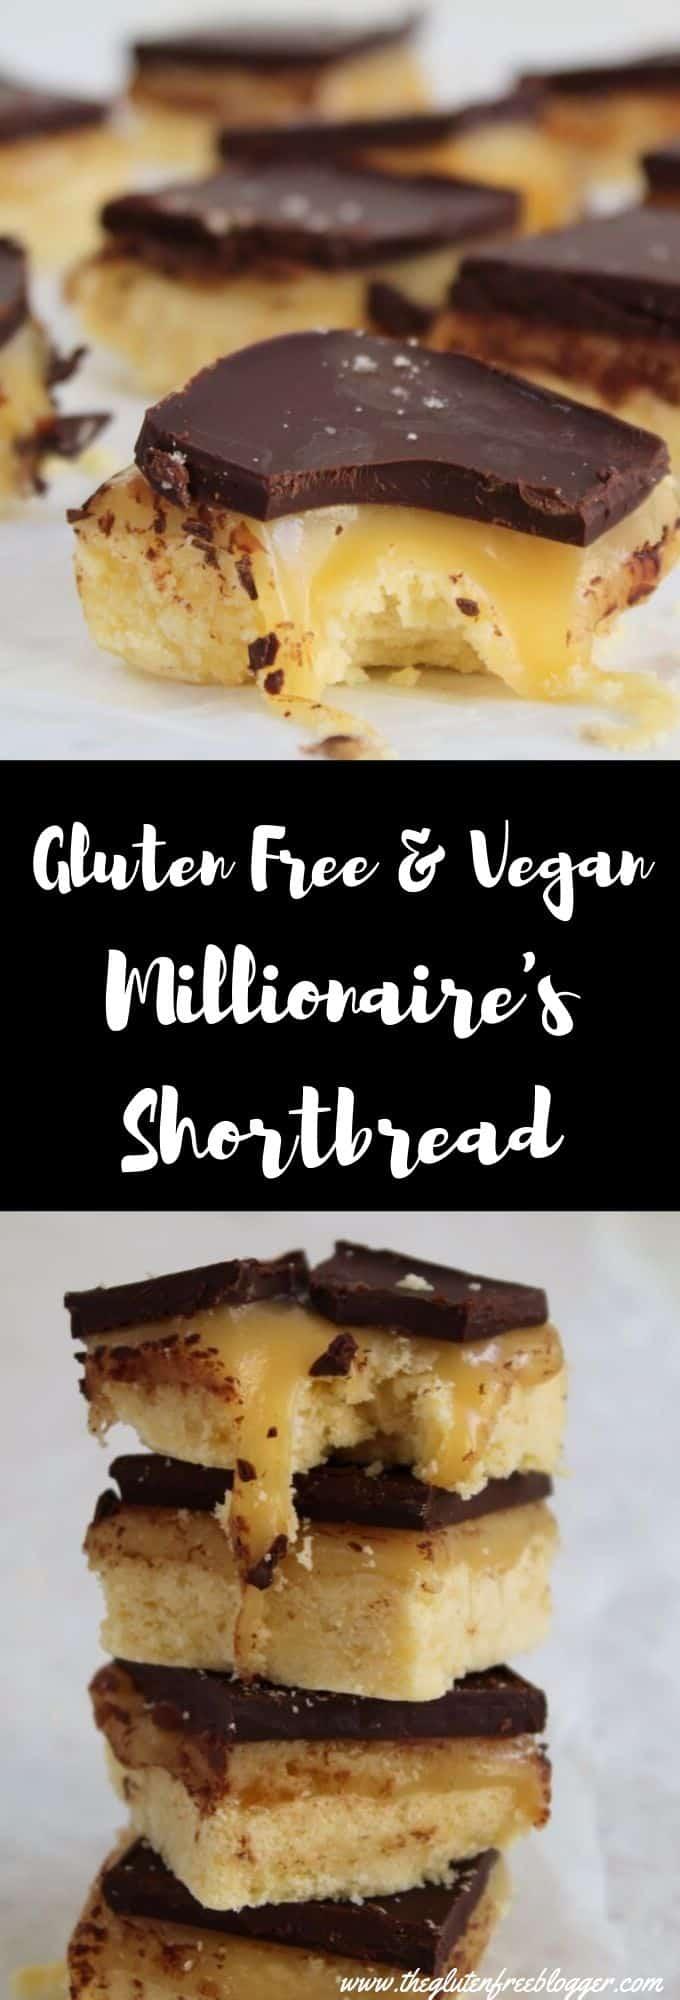 gluten free vegan millionaires shortbread recipe - gluten free dairy free caramel shortbread coeliac